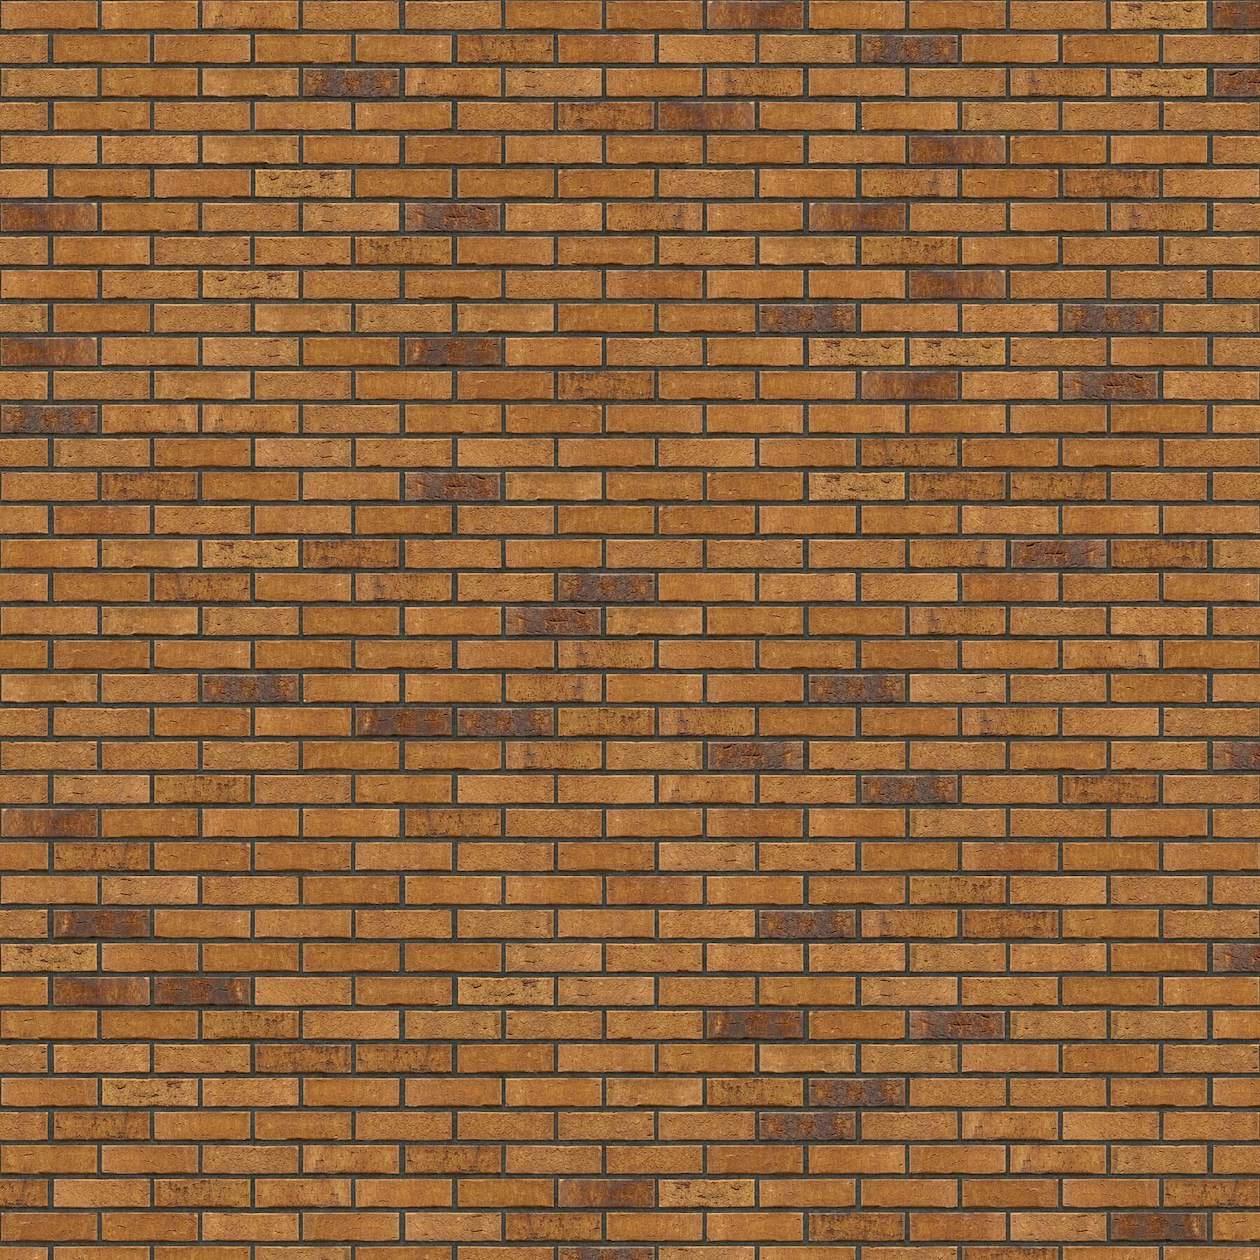 Puna-cigla-FeldHaus-Klinker-brick-house-nf-k-684-Antracit Fuga